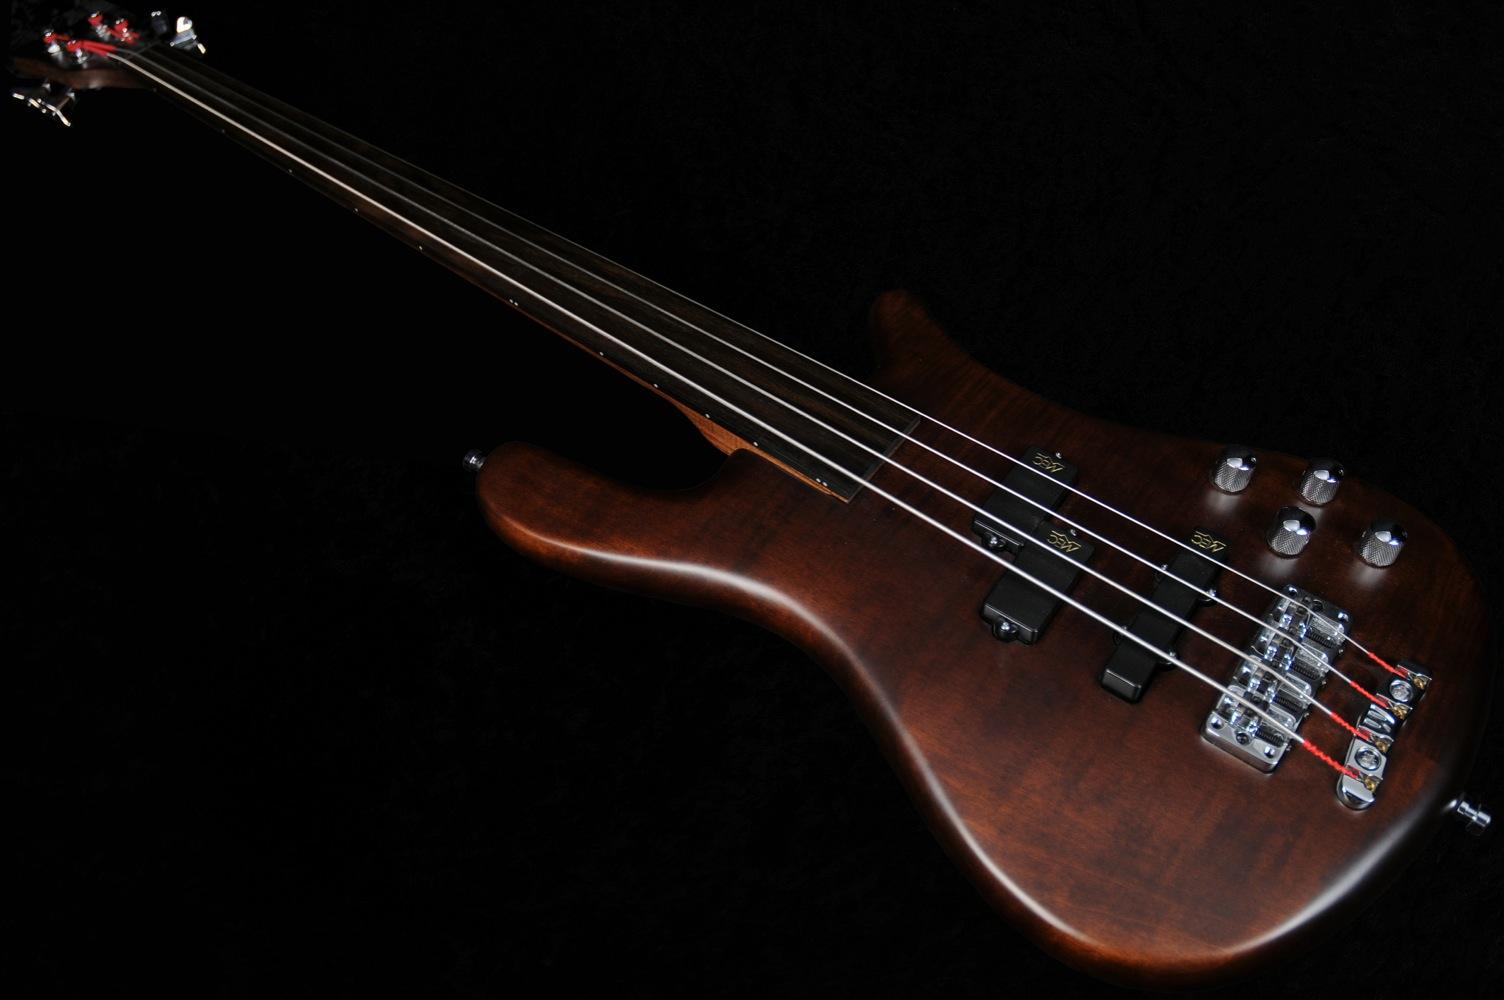 warwick streamer lx 4 string fretless bass guitar antique tobacco oil used 2008. Black Bedroom Furniture Sets. Home Design Ideas